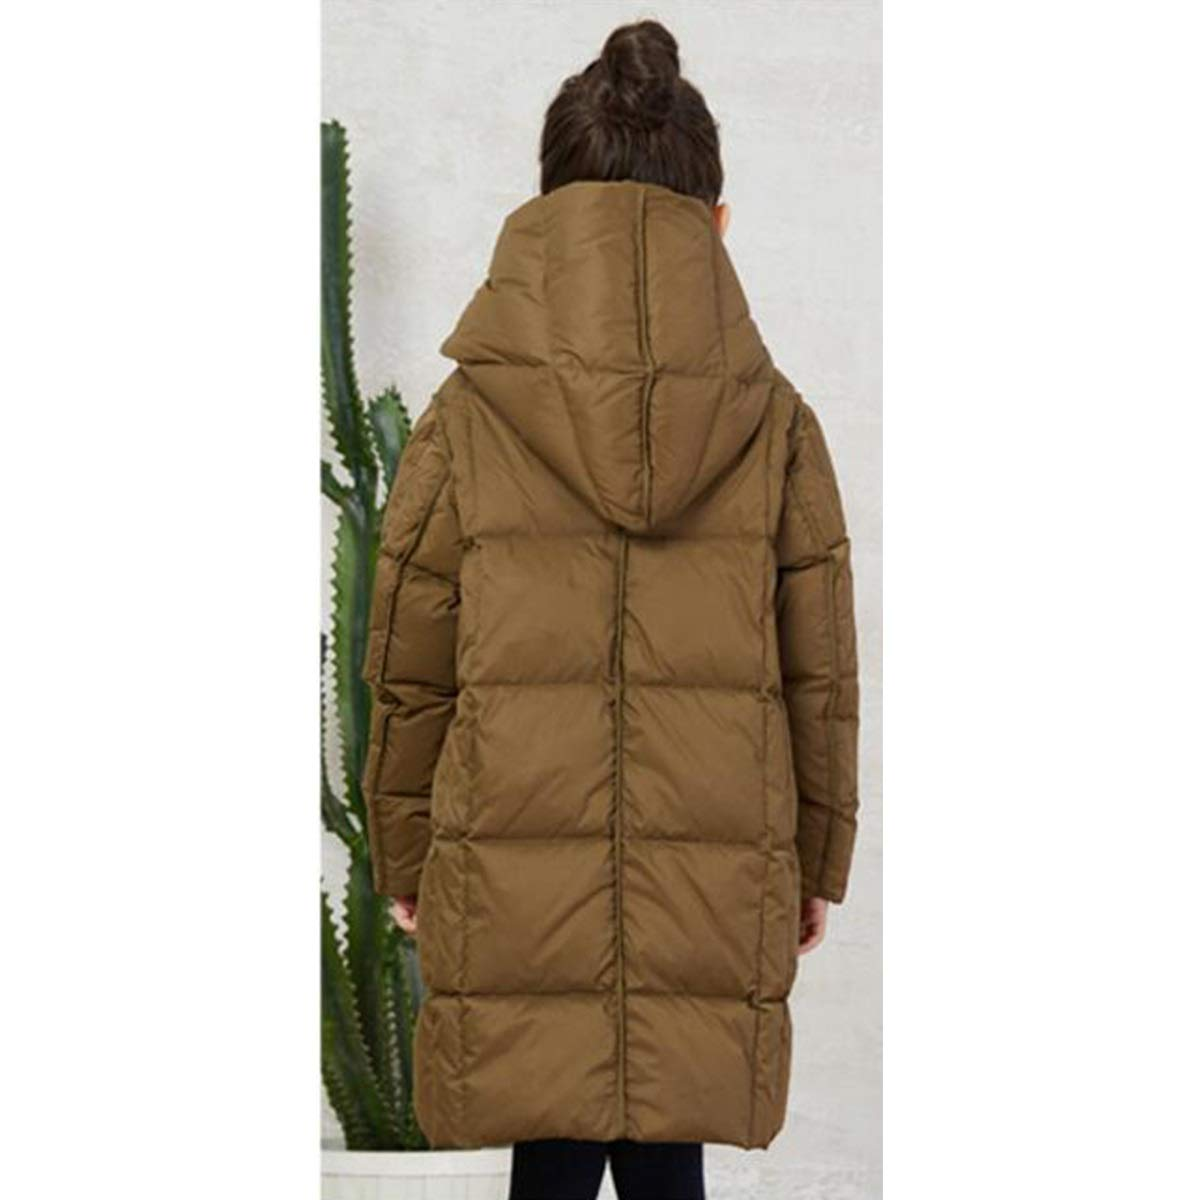 Gfsoediden Winter Long Jacket Toddler Girl Cotton Padded Hooded Coat Loose Outwear